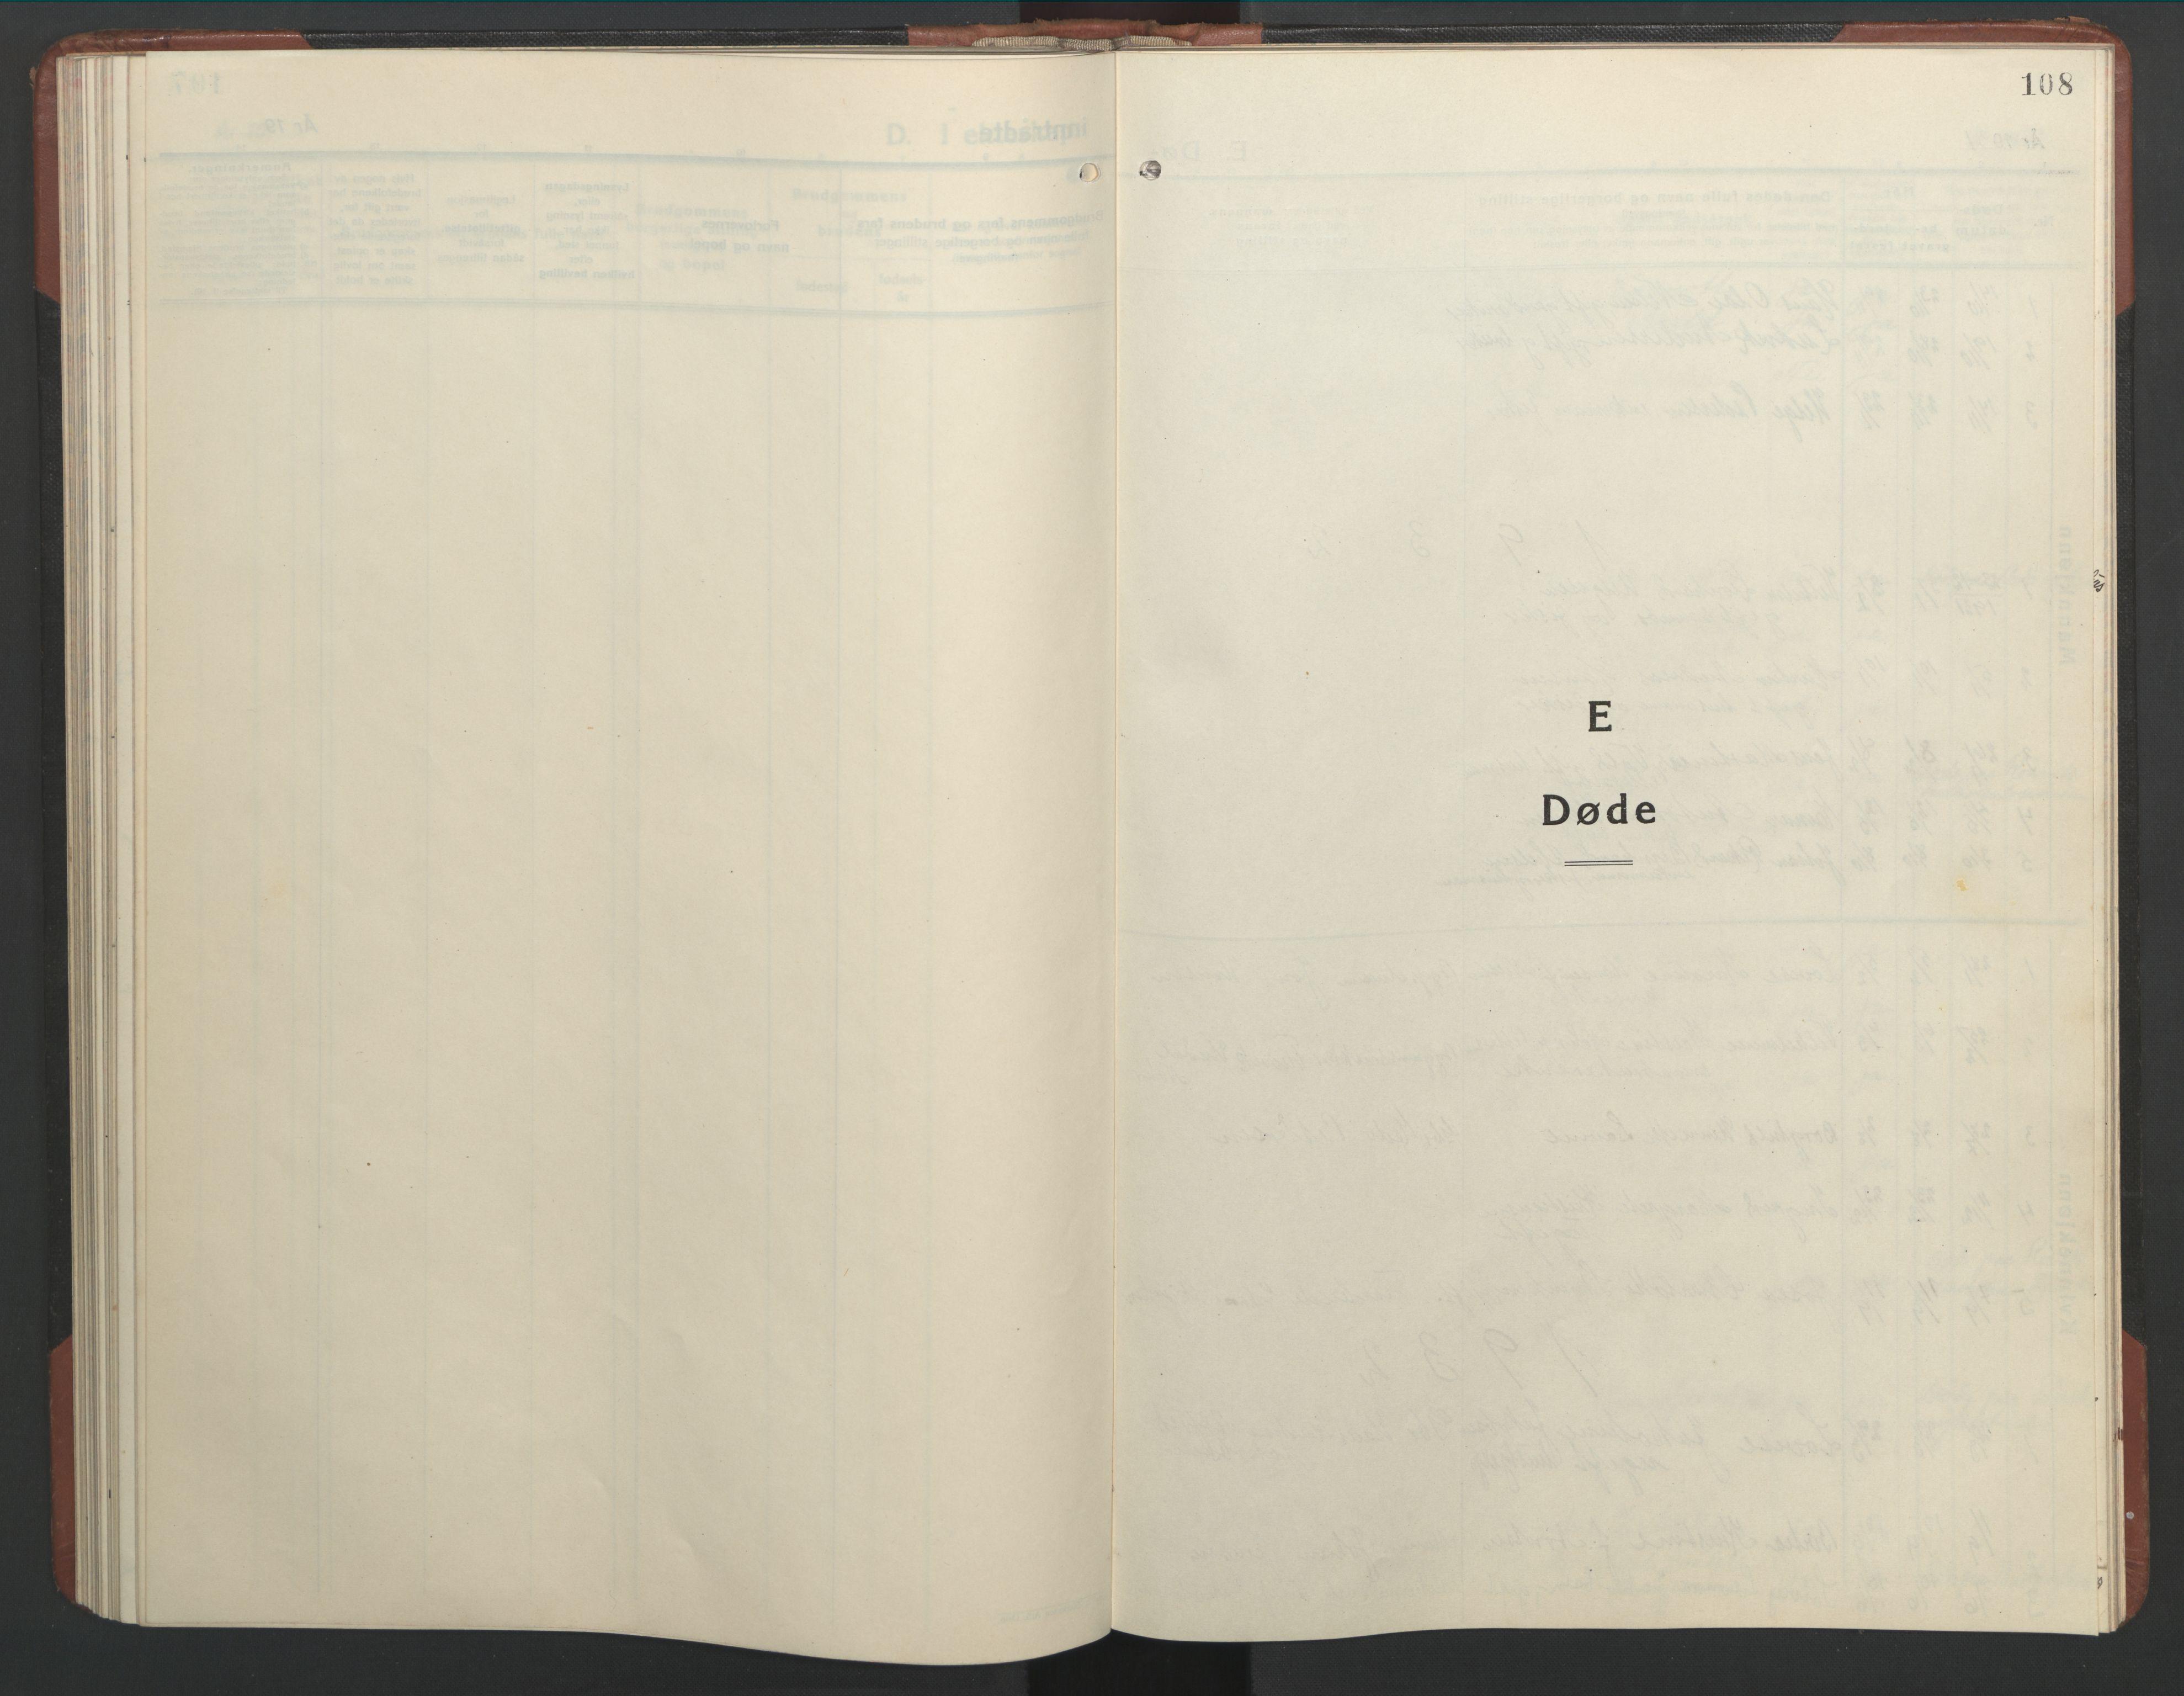 SAT, Ministerialprotokoller, klokkerbøker og fødselsregistre - Nordland, 803/L0078: Klokkerbok nr. 803C05, 1931-1952, s. 108